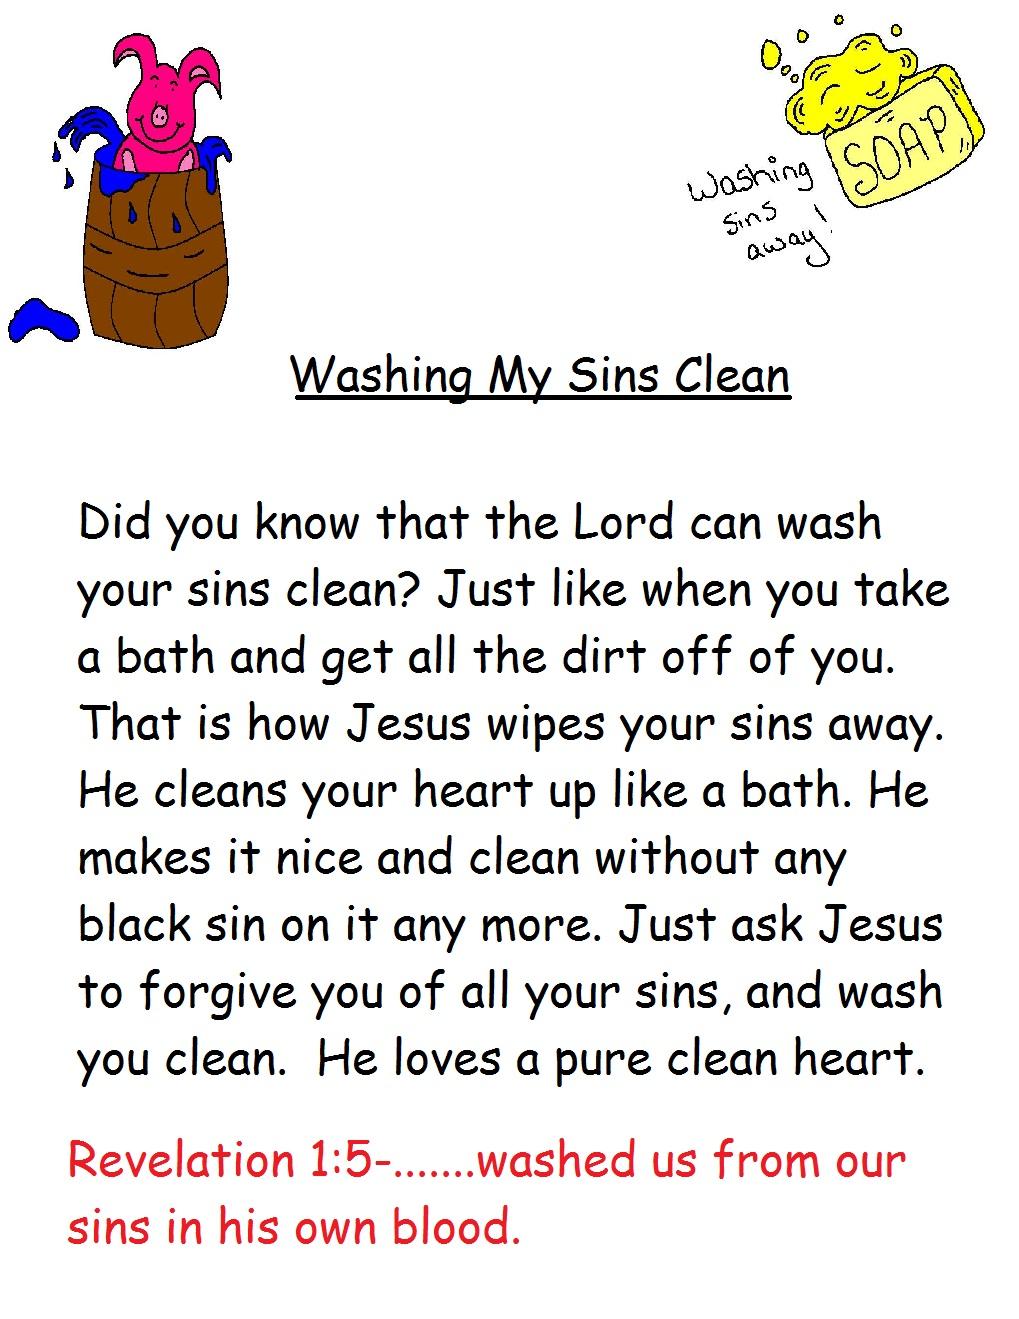 Washing Your Sins Away Sunday School